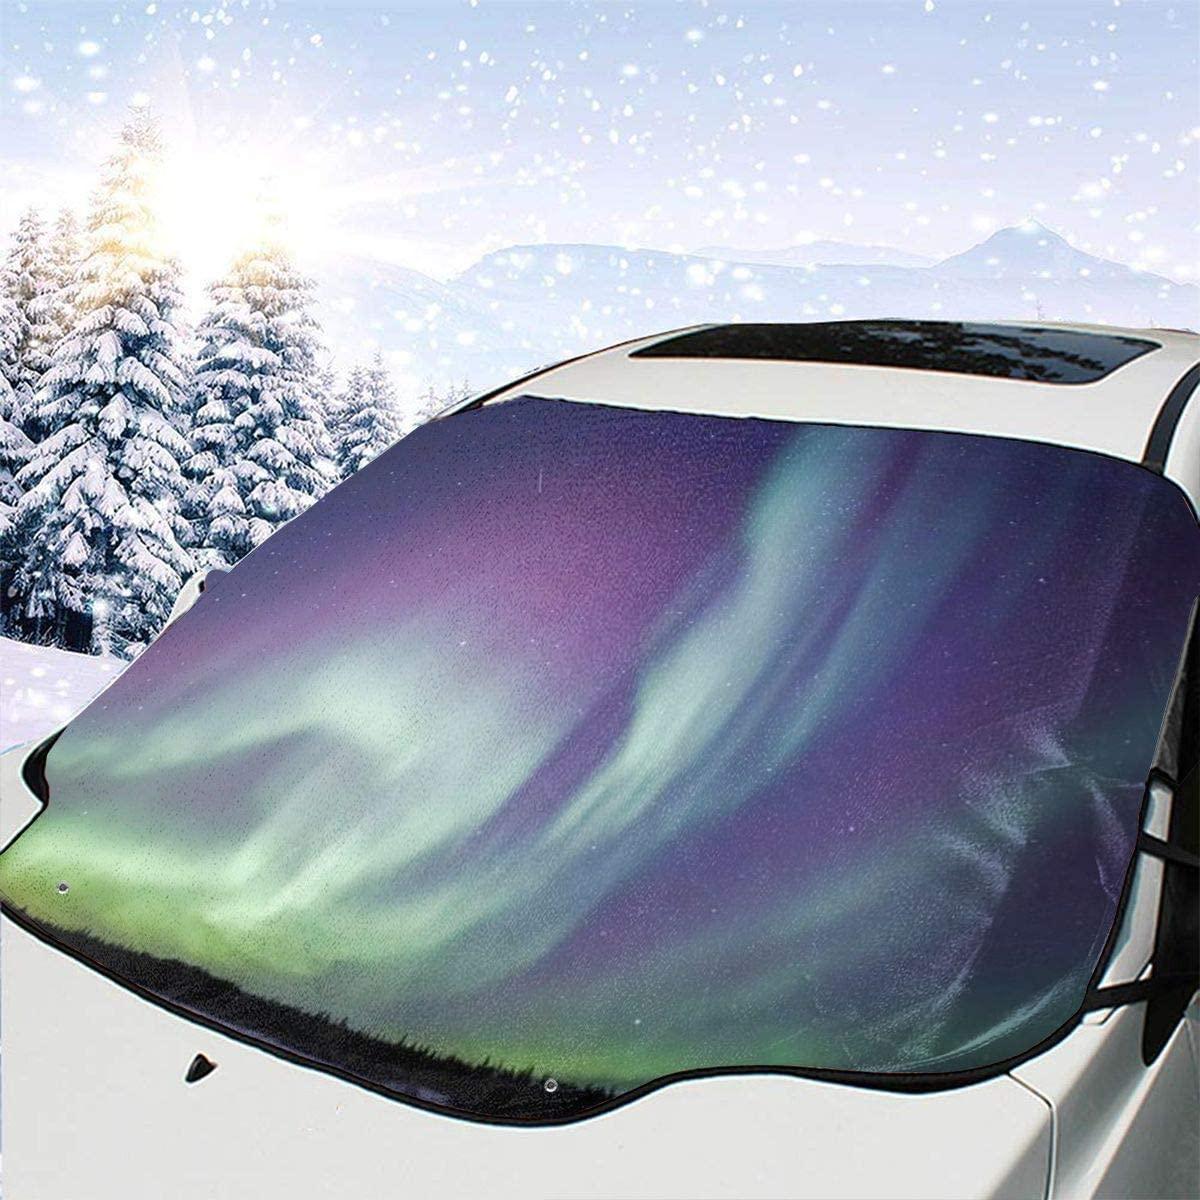 THONFIRE Car Front Window Windshield Winter Sunshade Northern Lights Adventure Cover Waterproof Blocks Heat Damage Free Visor Protector Automobile Summer Heatshield